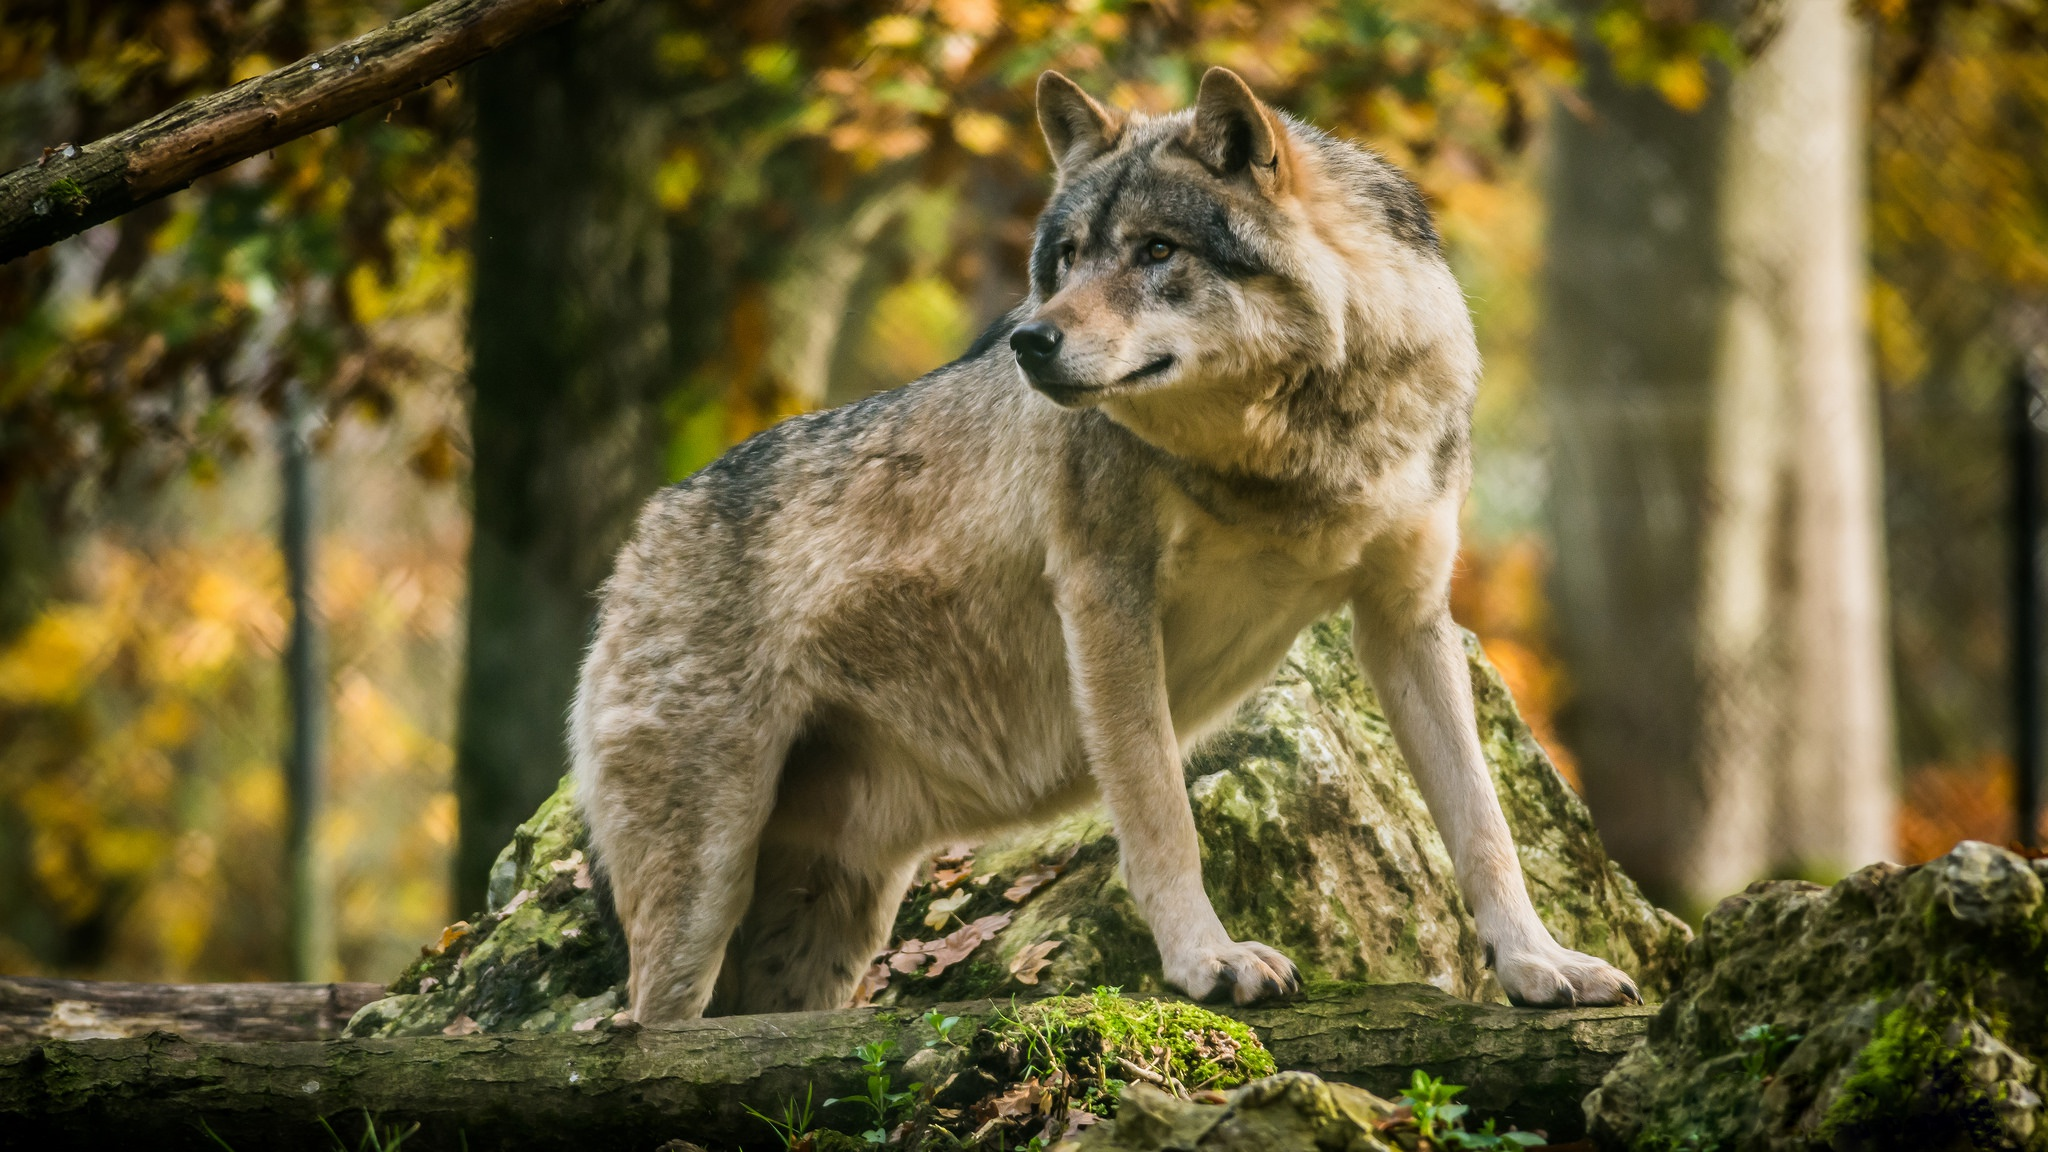 прошла кастинг, картинки серые волки на обои шесте